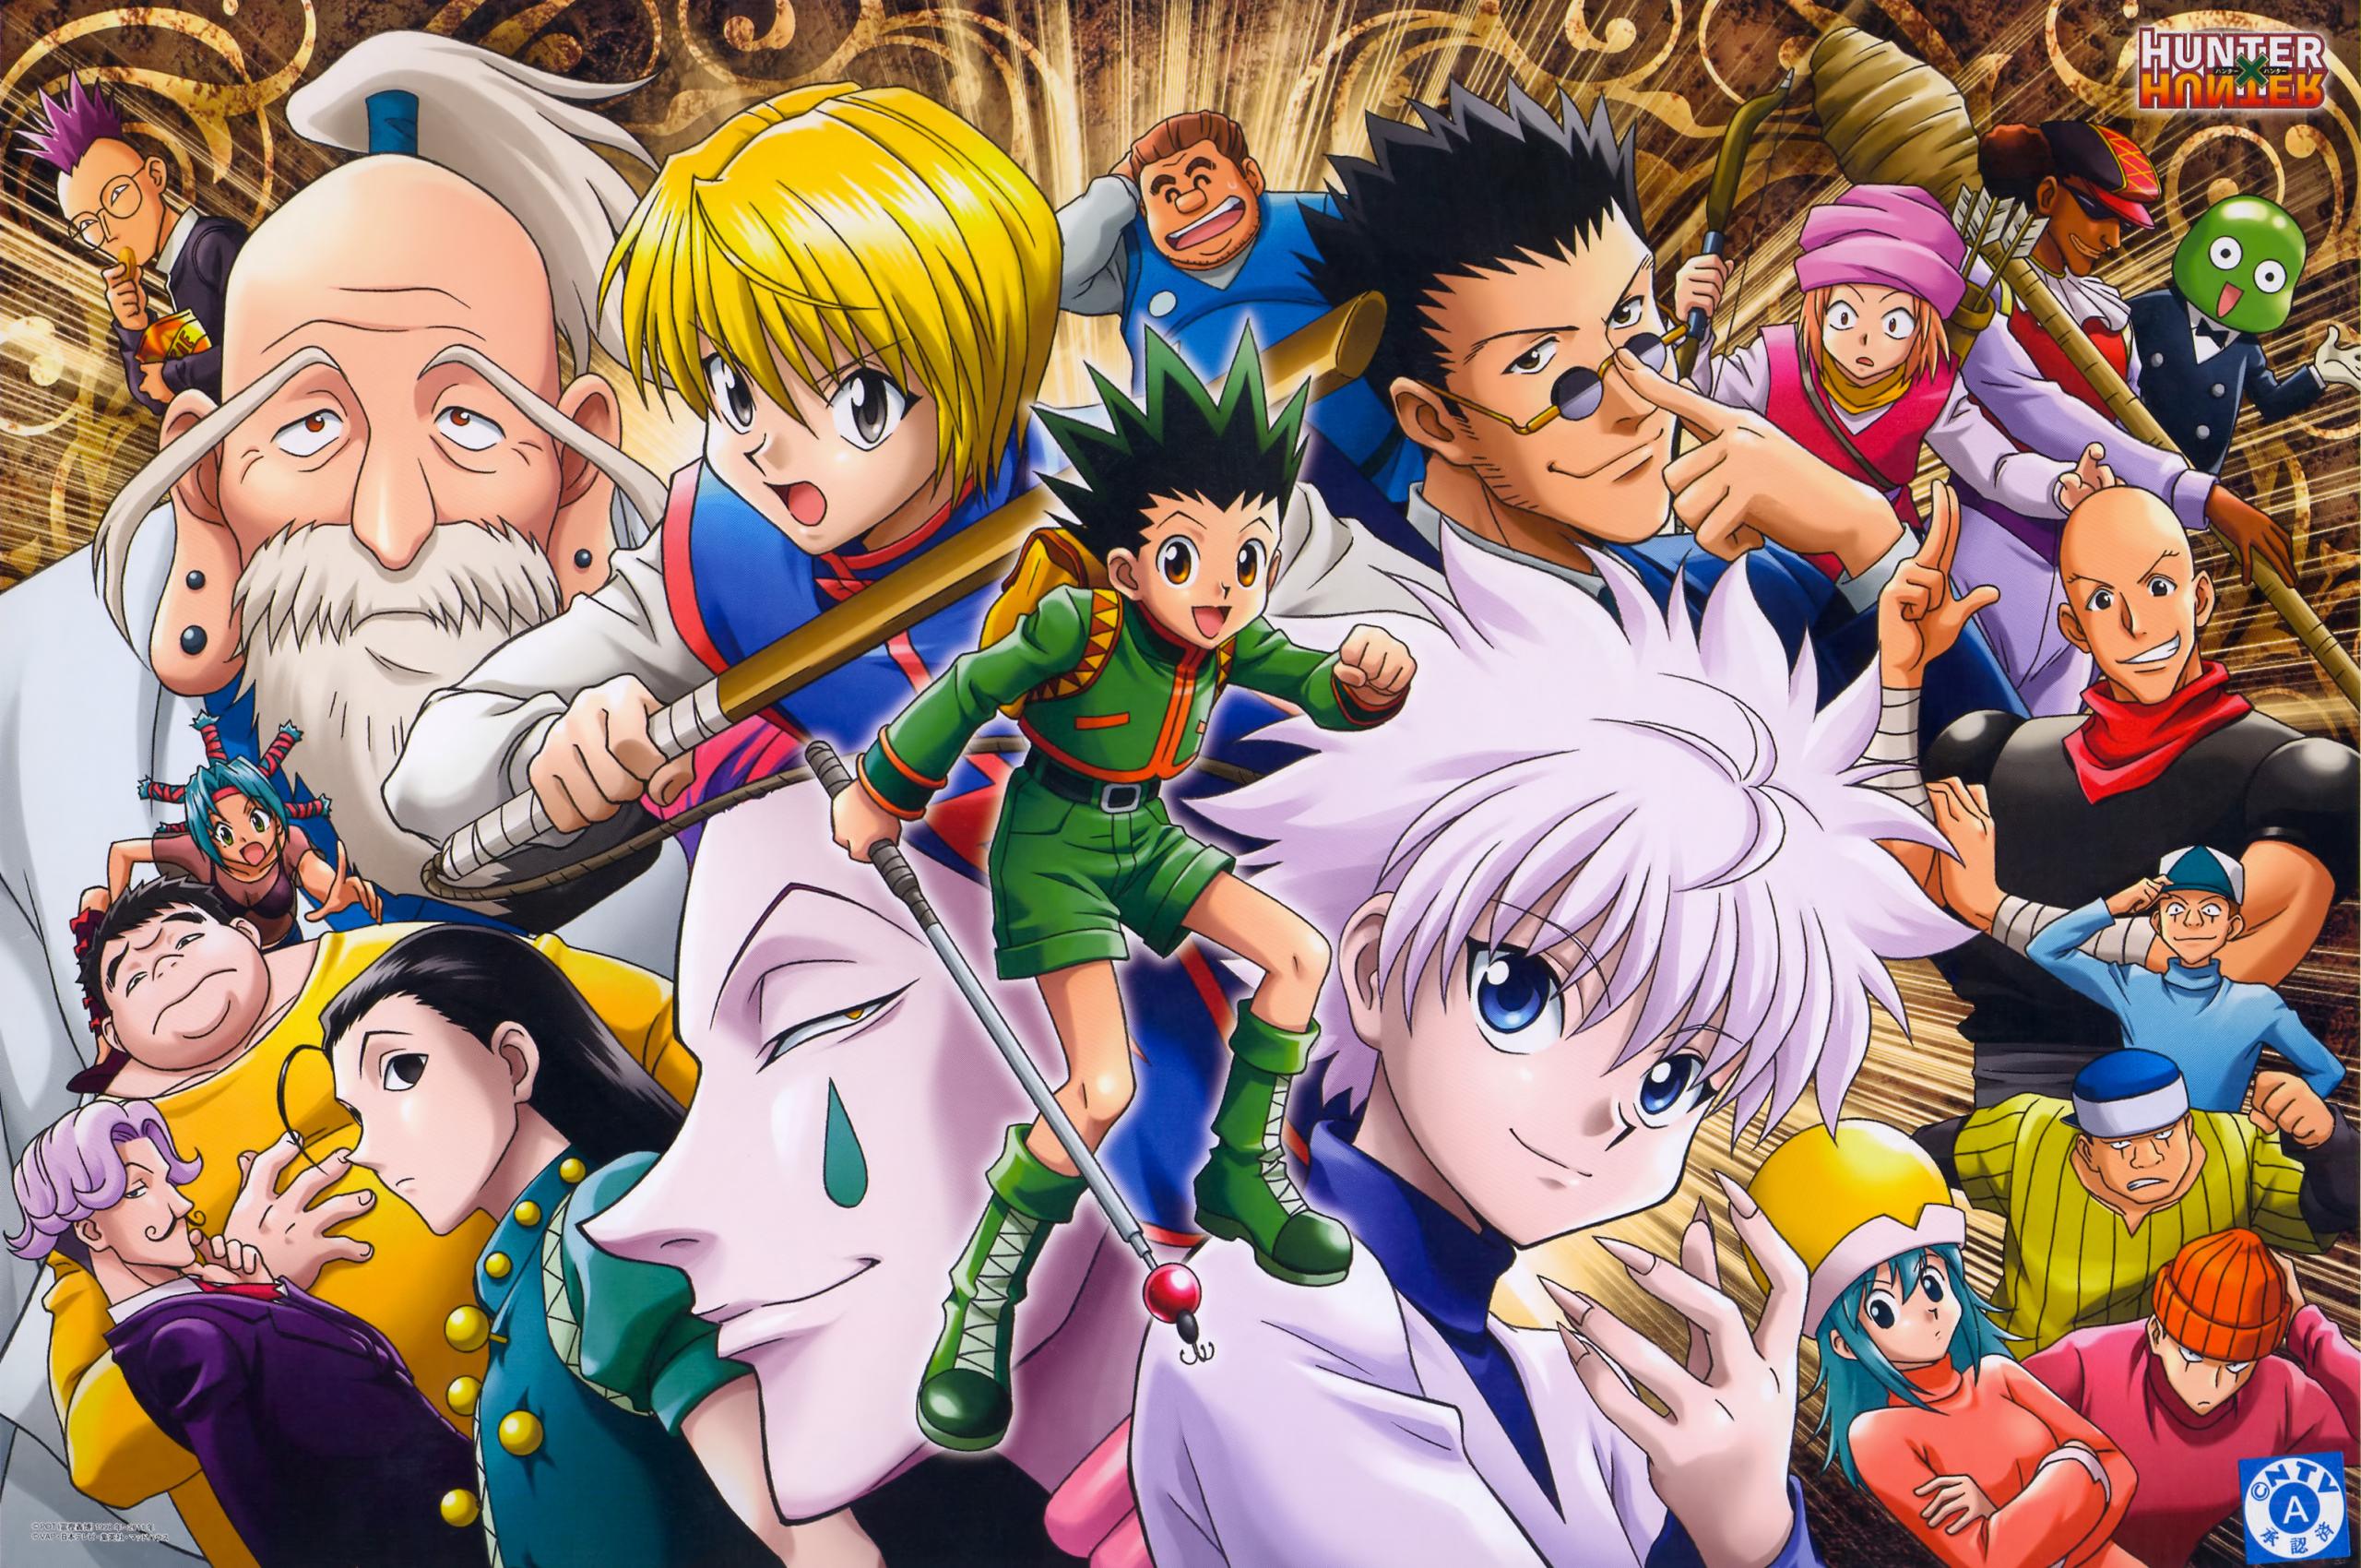 Free Download Hunter X Hunter Anime Hd Wallpaper Animation